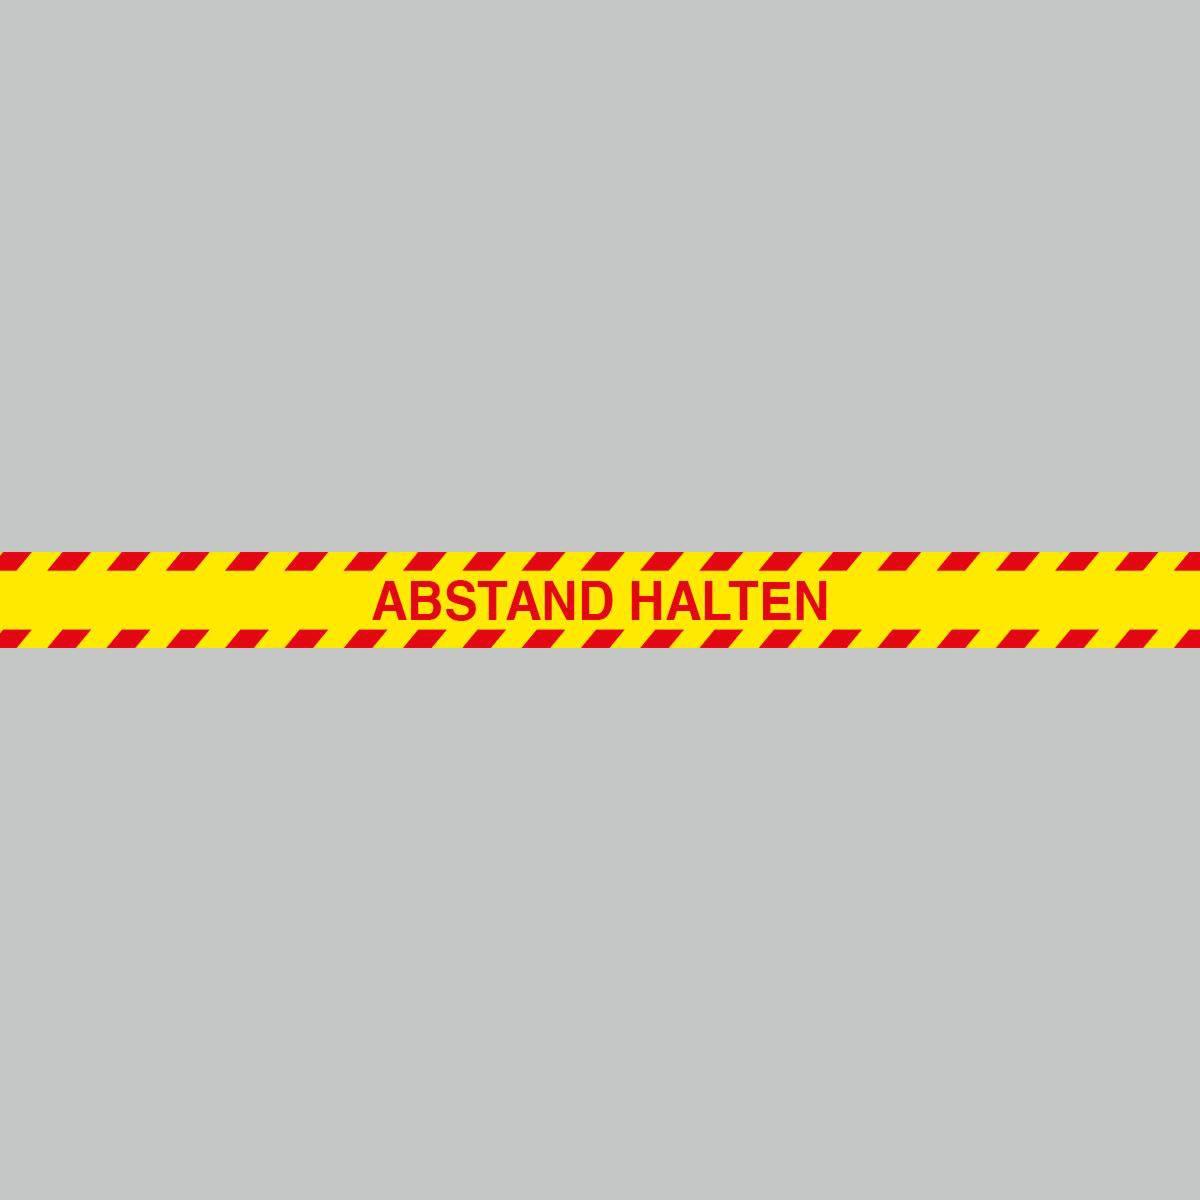 Fußbodenaufkleber rot-gelb, rechteckig 120x9,6cm – Abstand halten